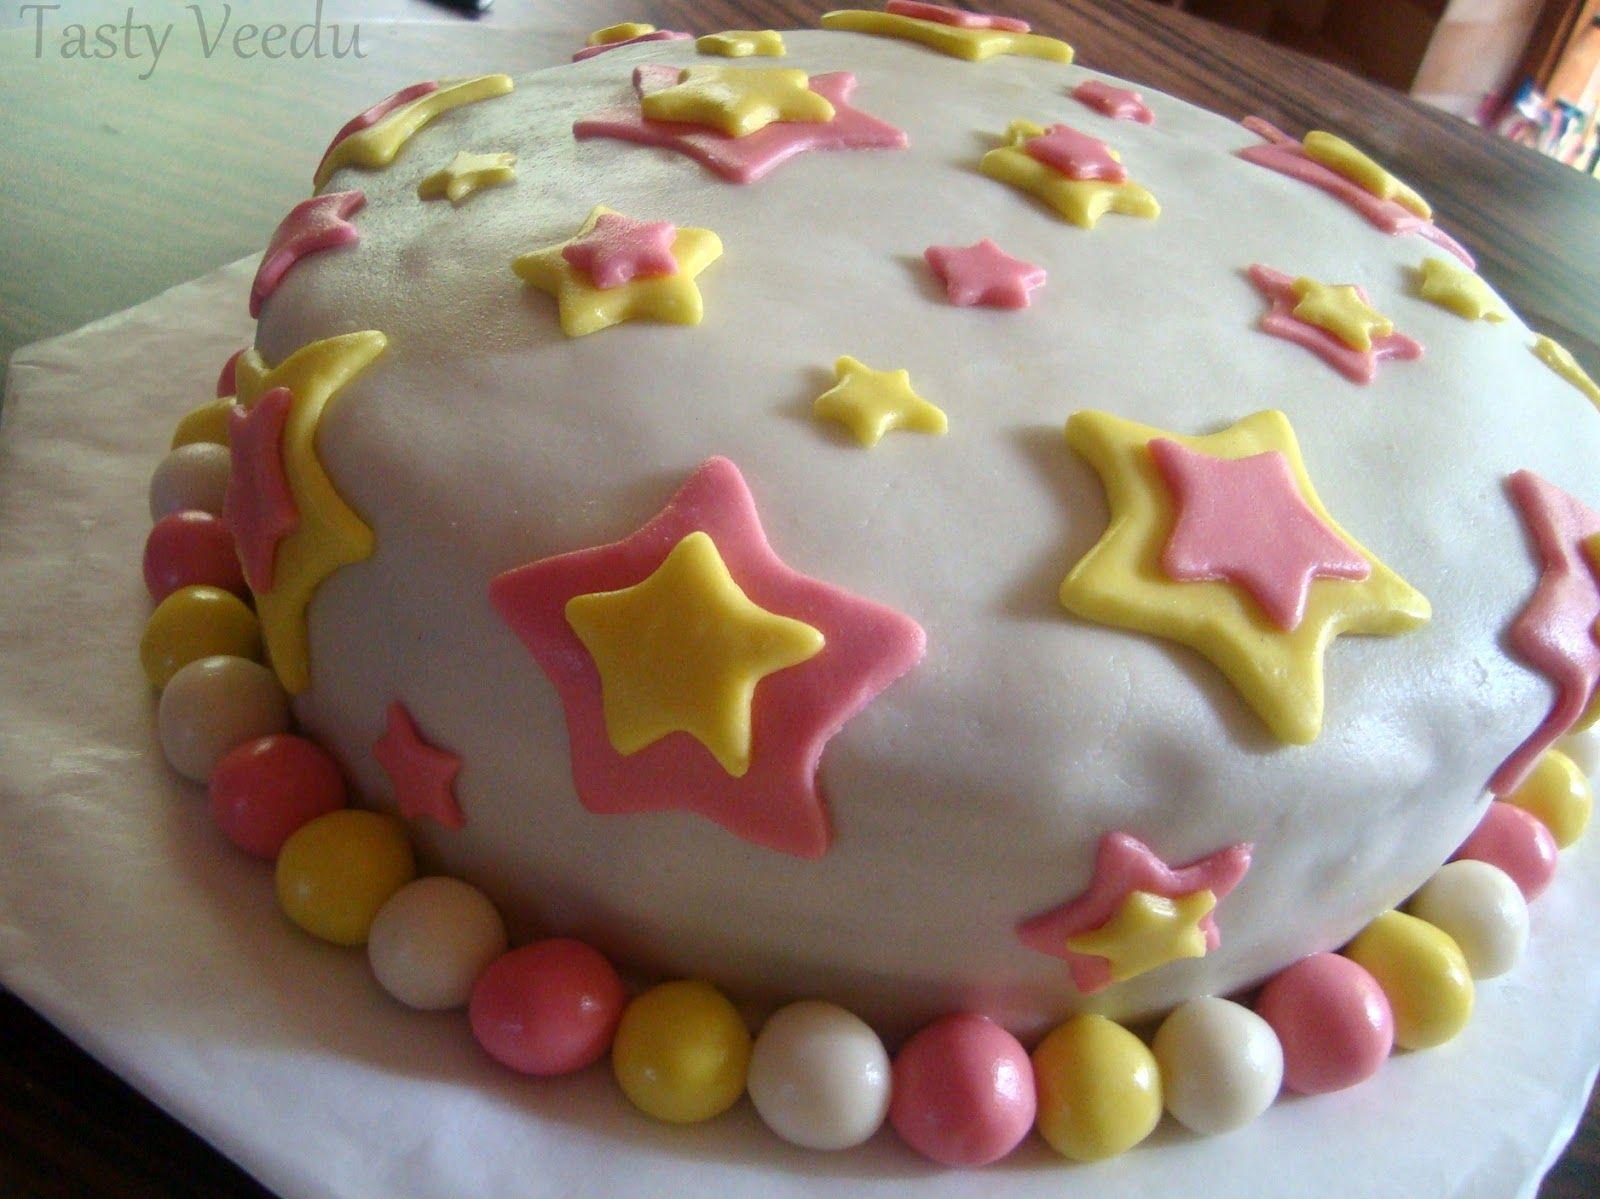 FondantIcing PERFECT VANILLA BUTTER CAKE FOR FONDANT